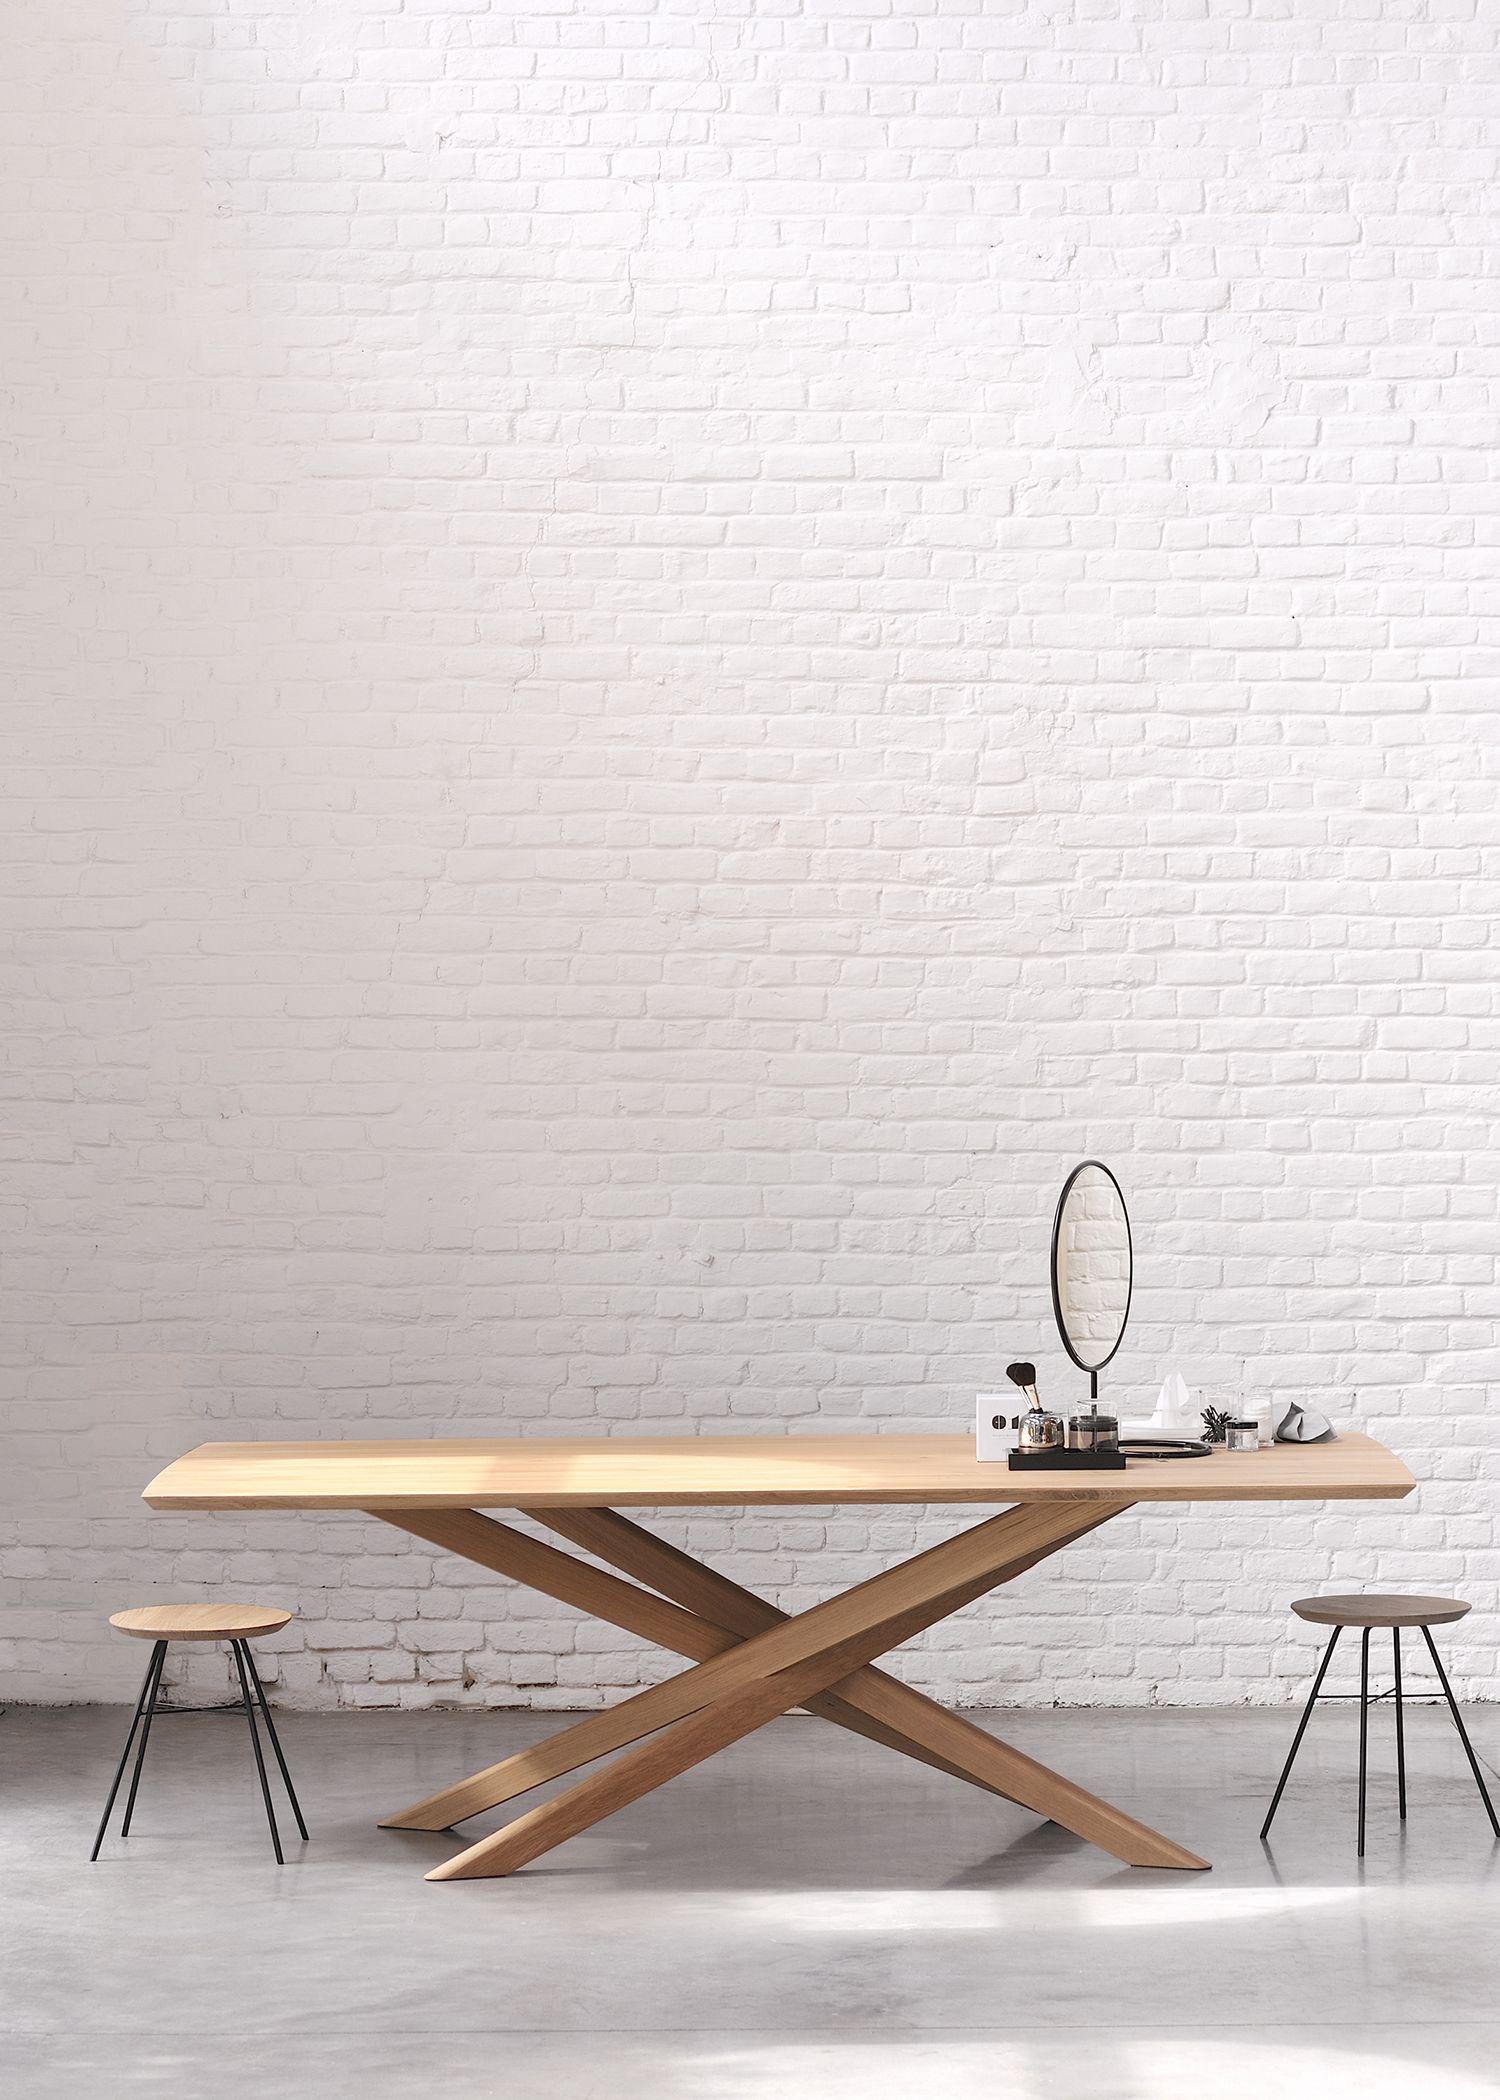 Mikado Dining Table Oak Dining Table Dining Table Legs Dining Table Design [ 2100 x 1500 Pixel ]